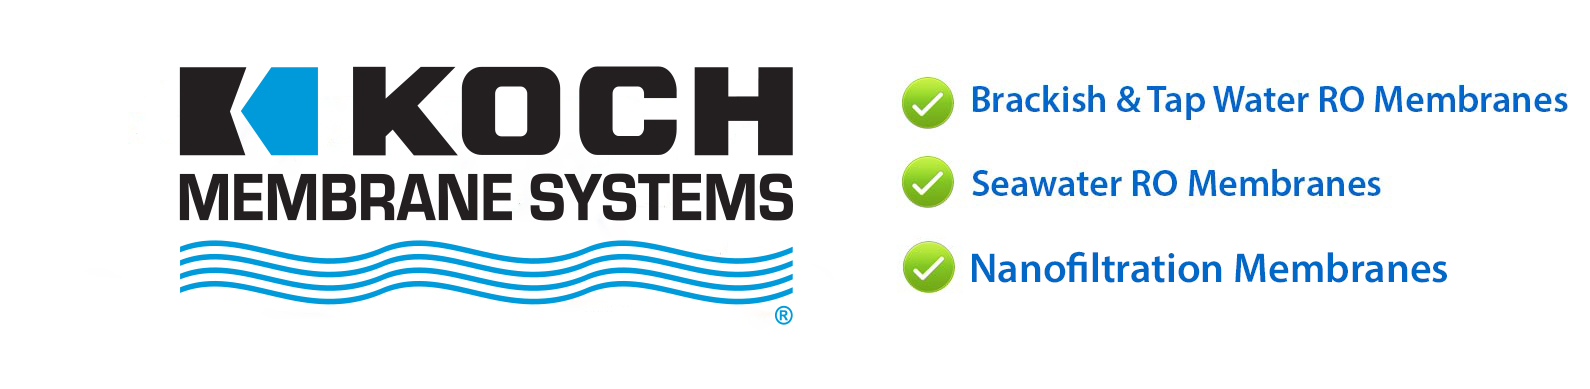 koch-membrane-system-brakish-tap-and-seawater.jpg